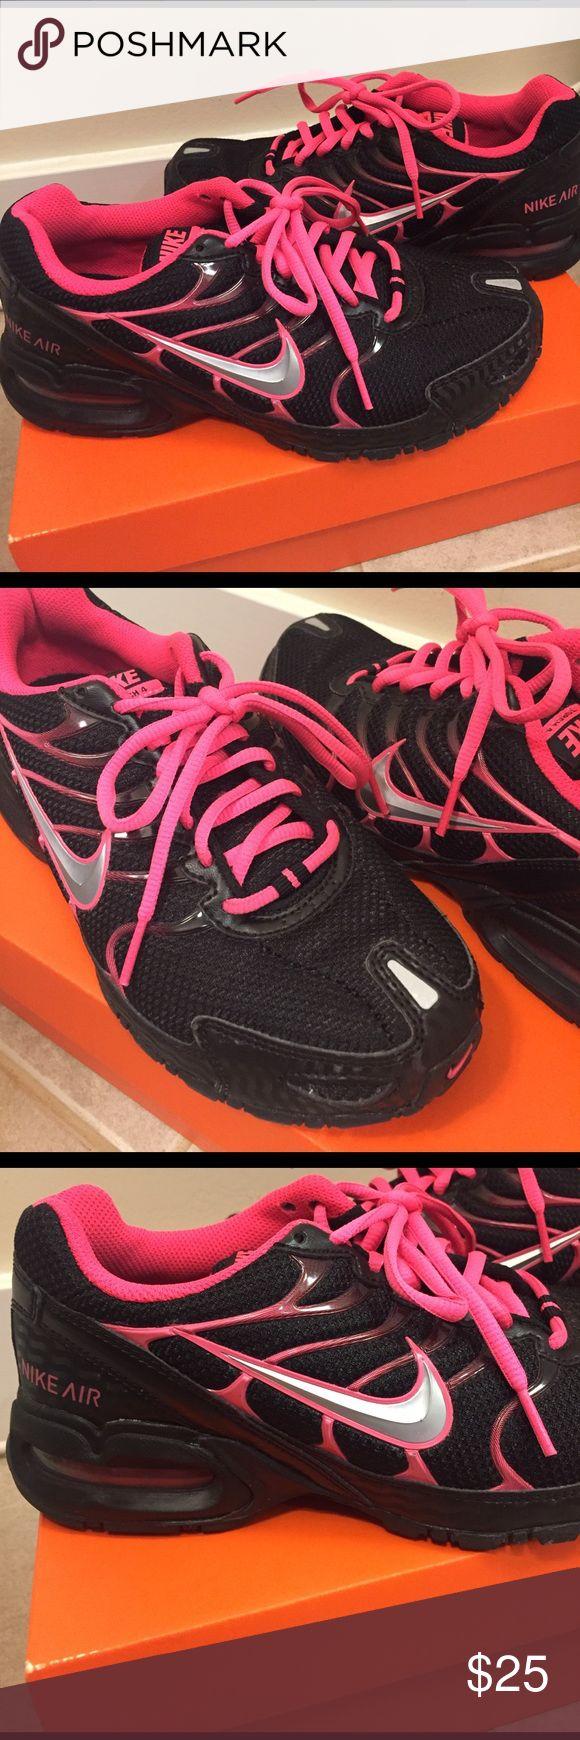 Nike air max torch 4 running shoe - Women S Nike Air Max Torch 4 Sneakers